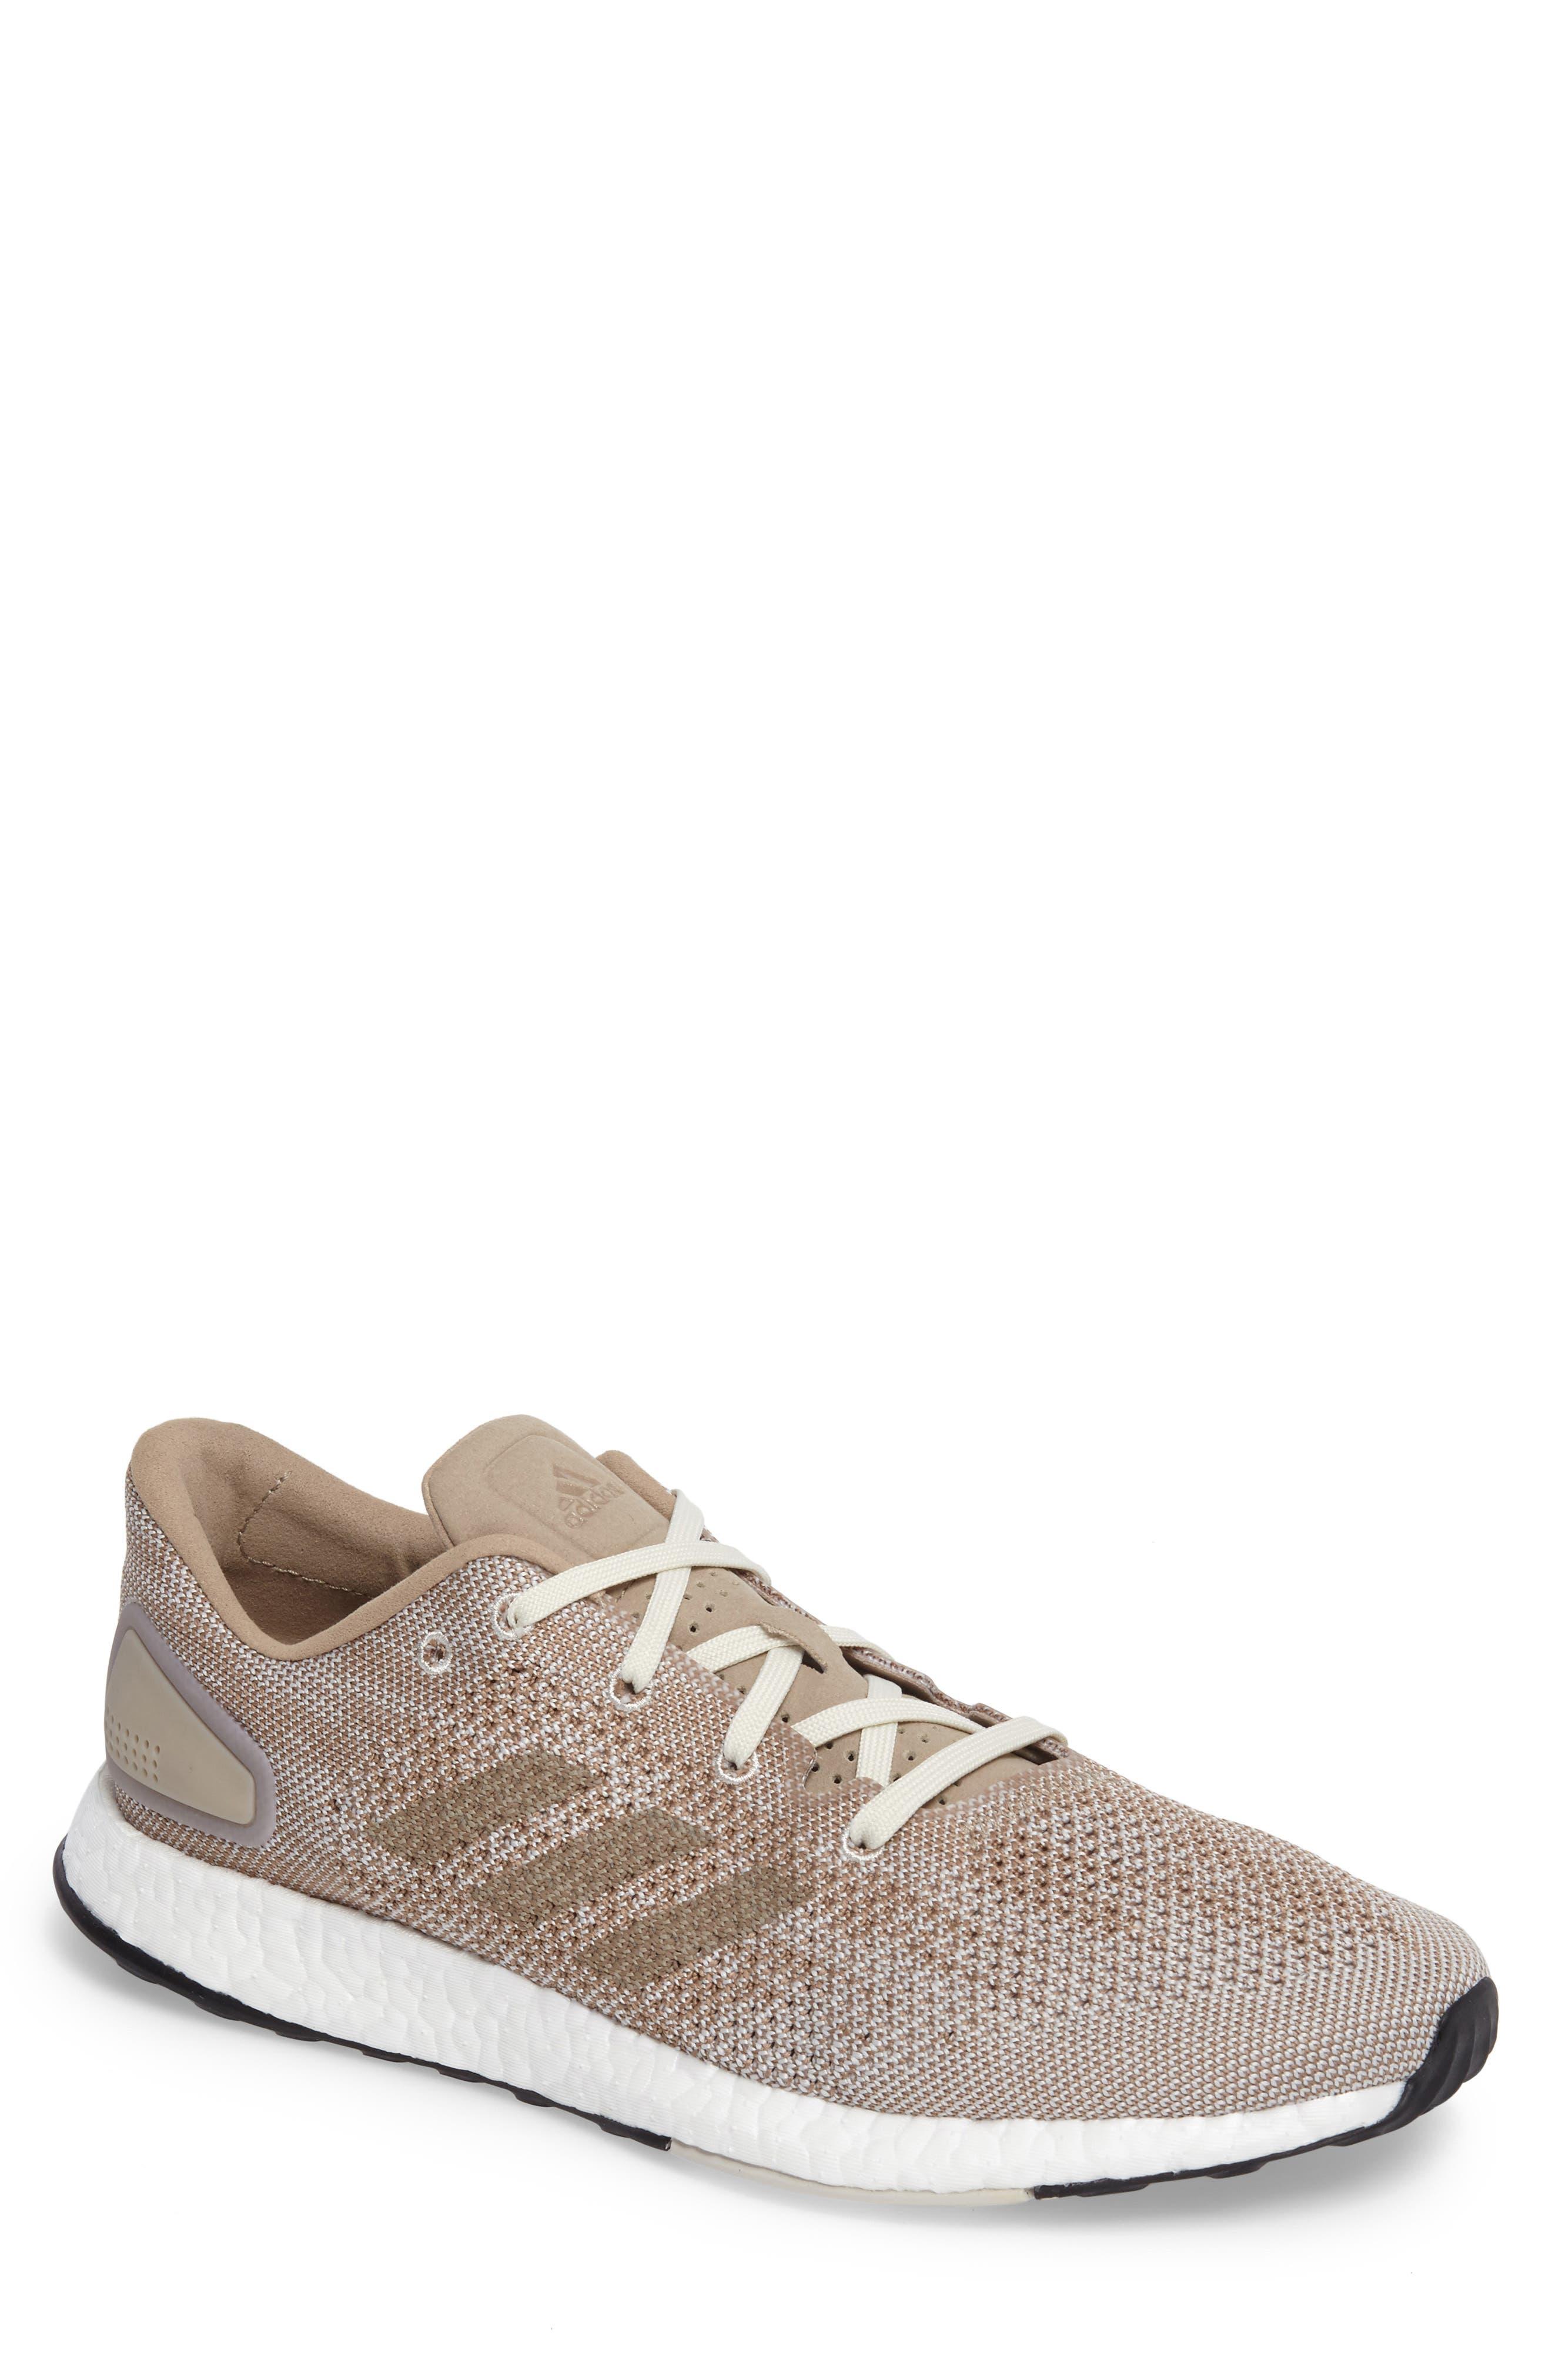 Alternate Image 1 Selected - adidas Pureboost DPR Running Shoe (Men)